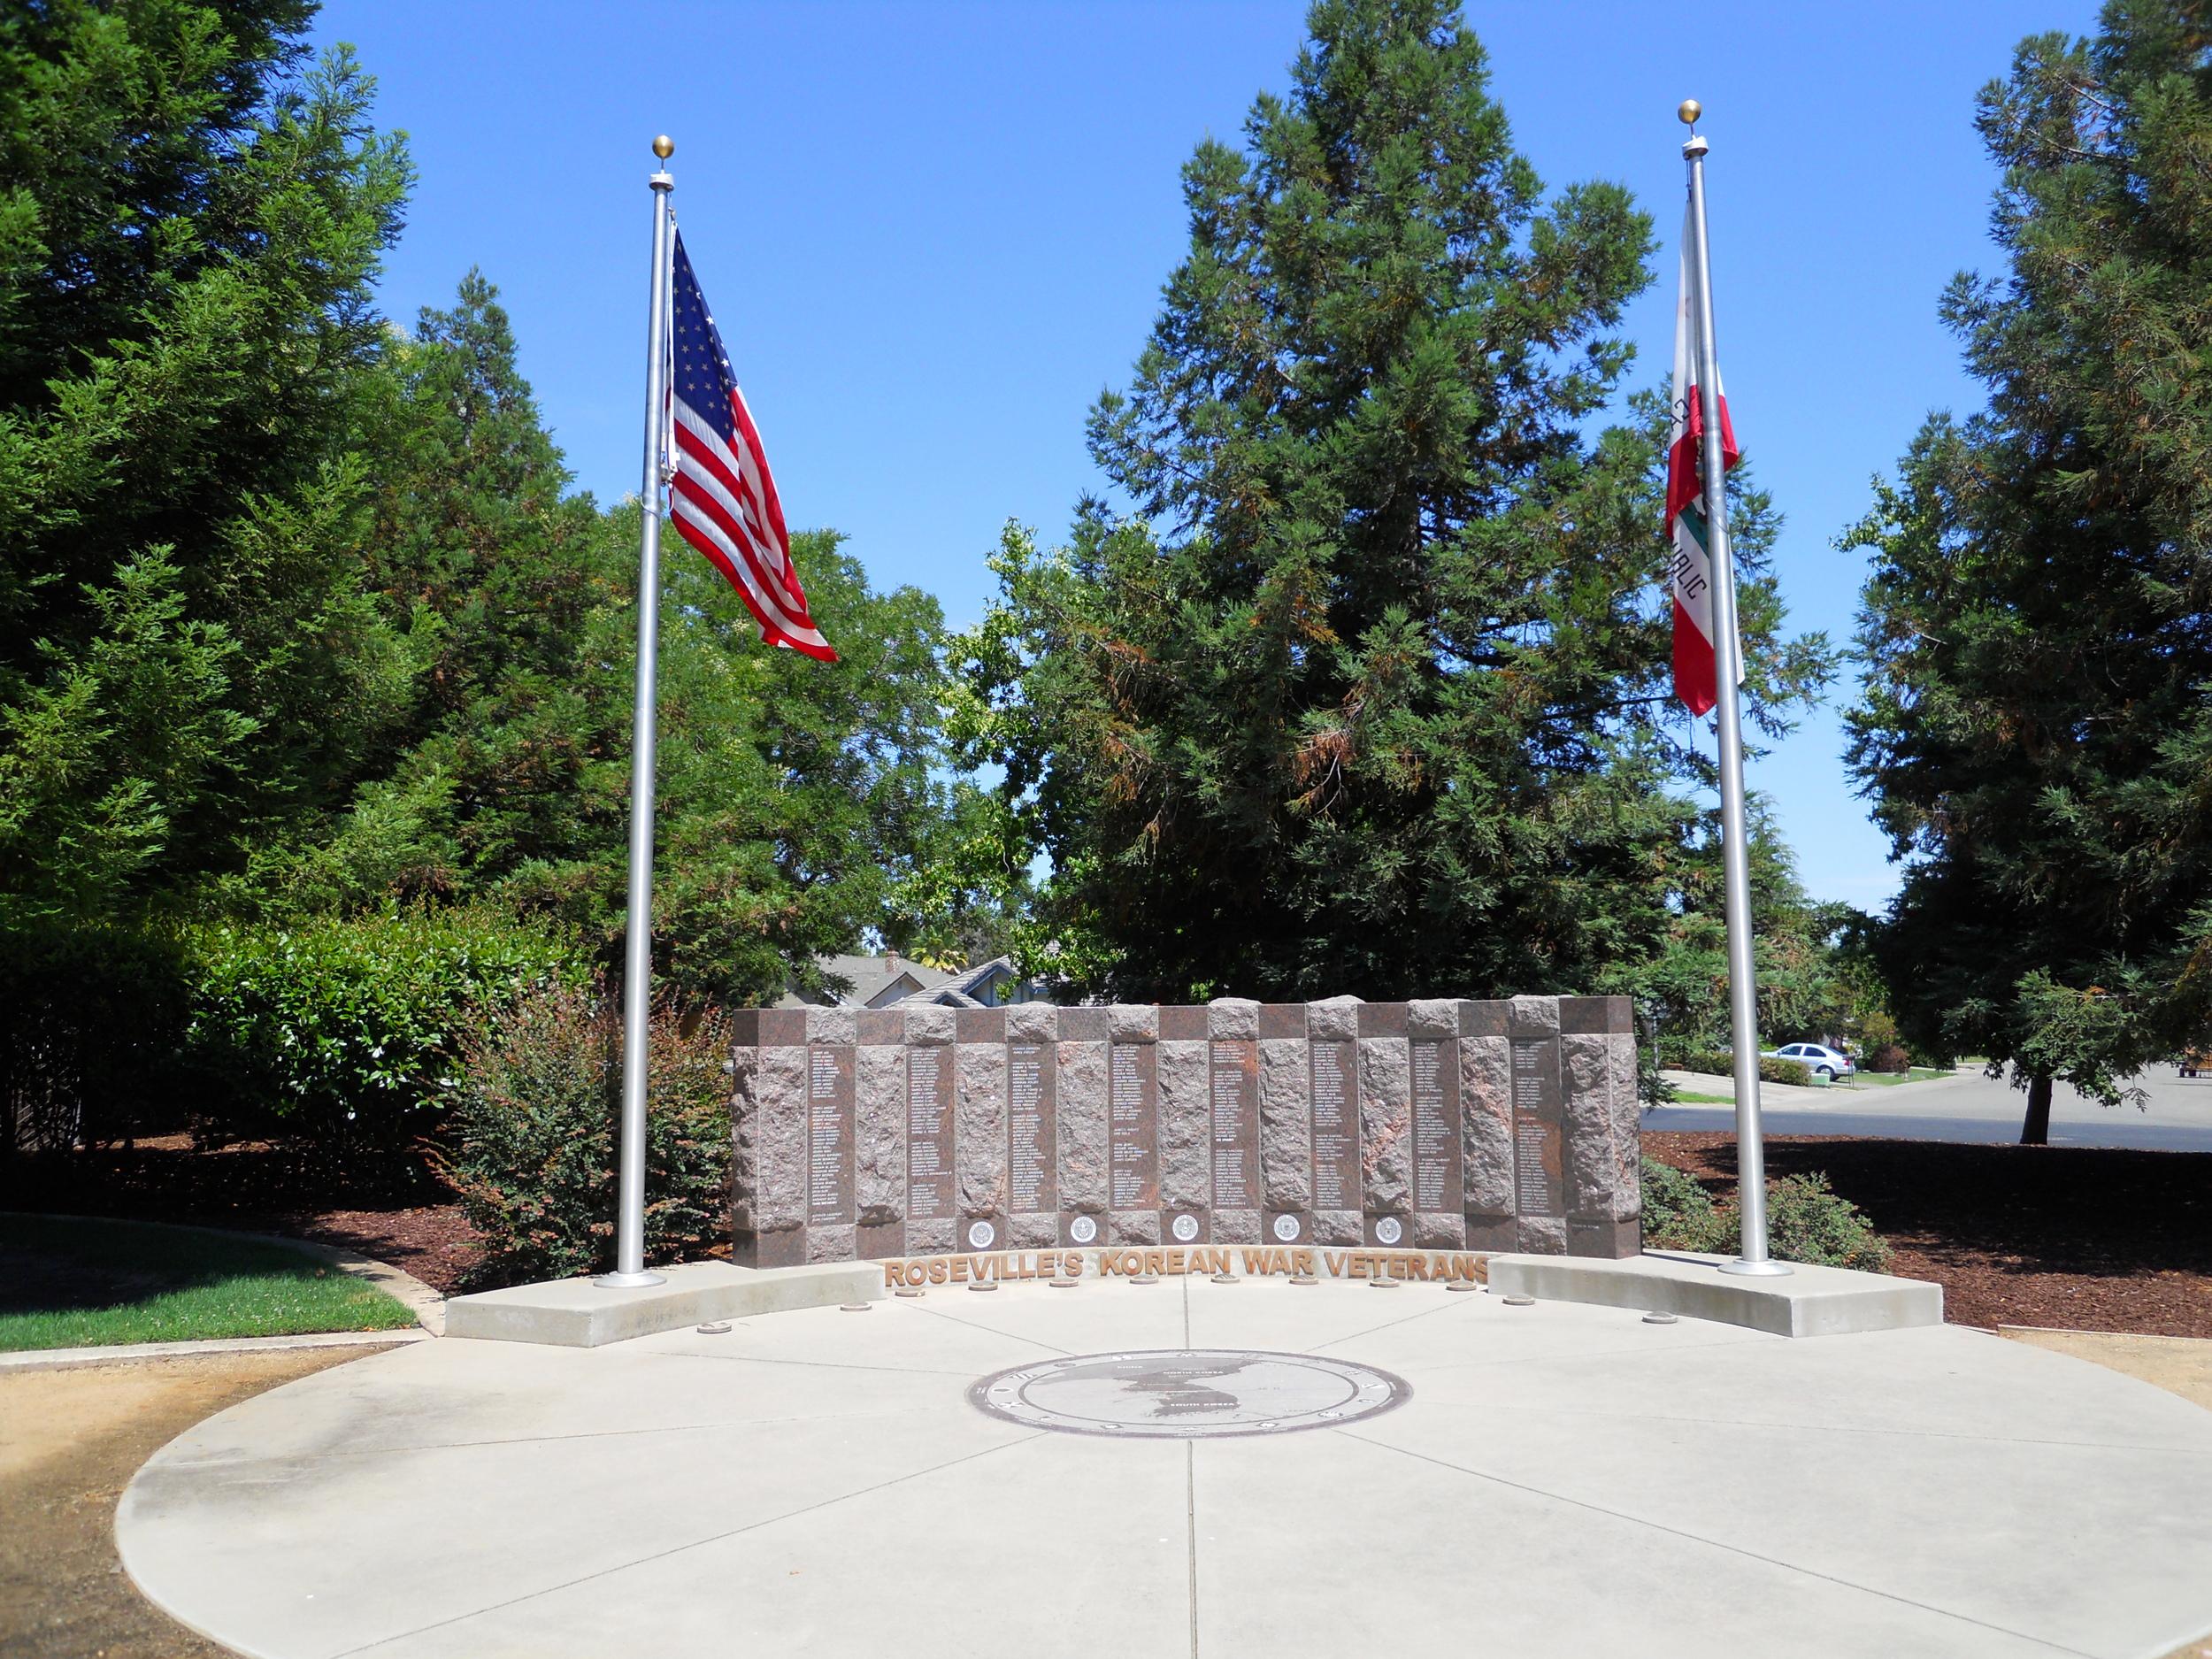 "The monument to ""Roseville's Korean War Veterans"" was installed in 2000."